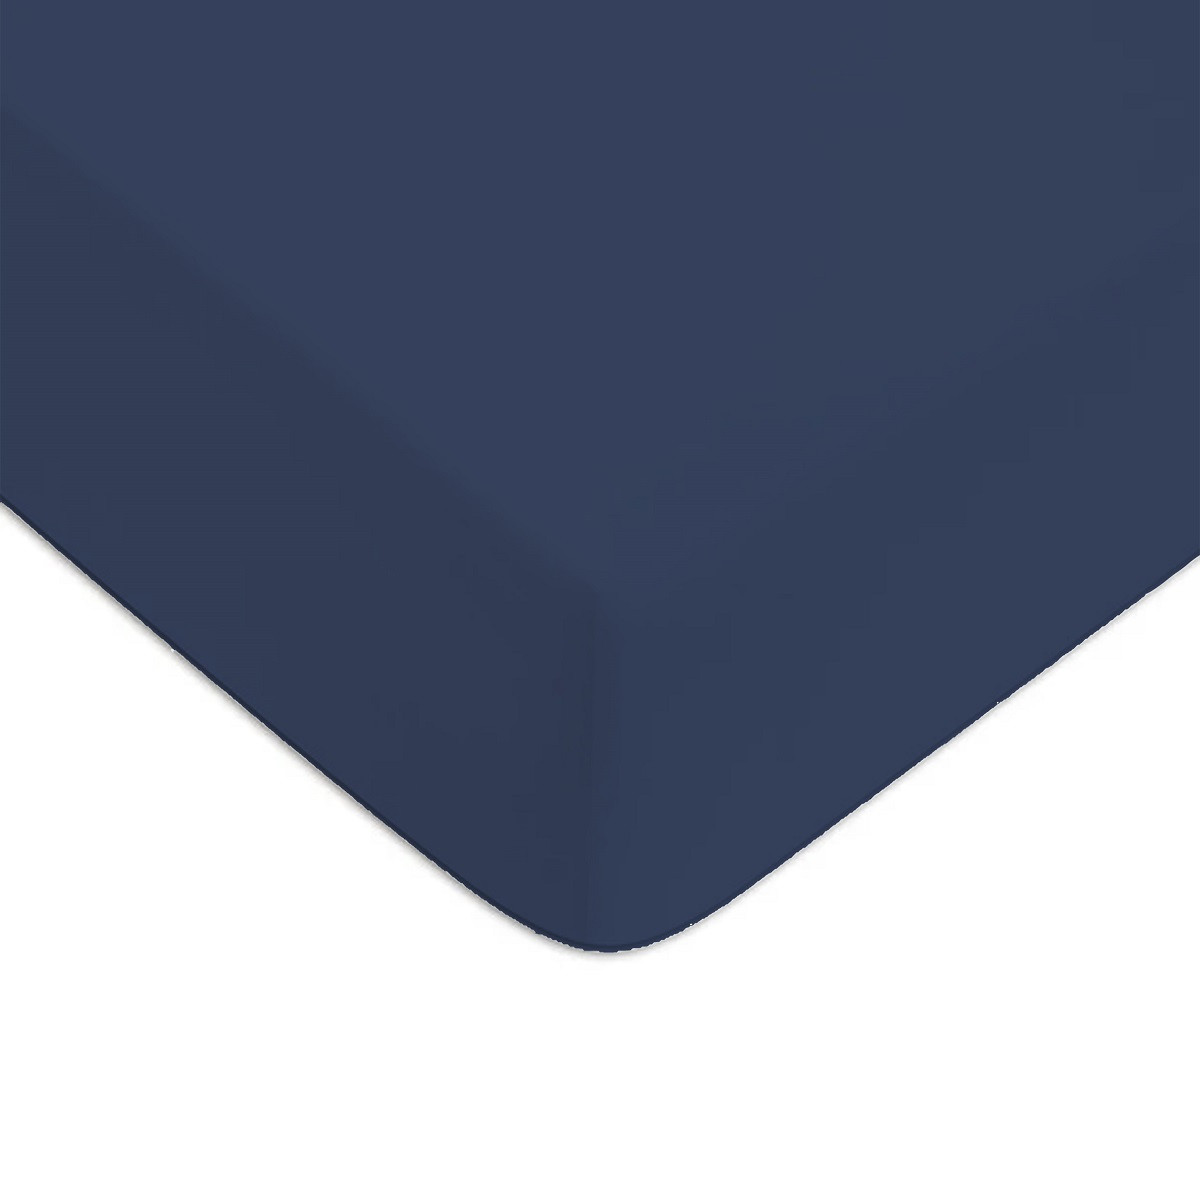 Drap housse Bleu 160x200cm 57 fils